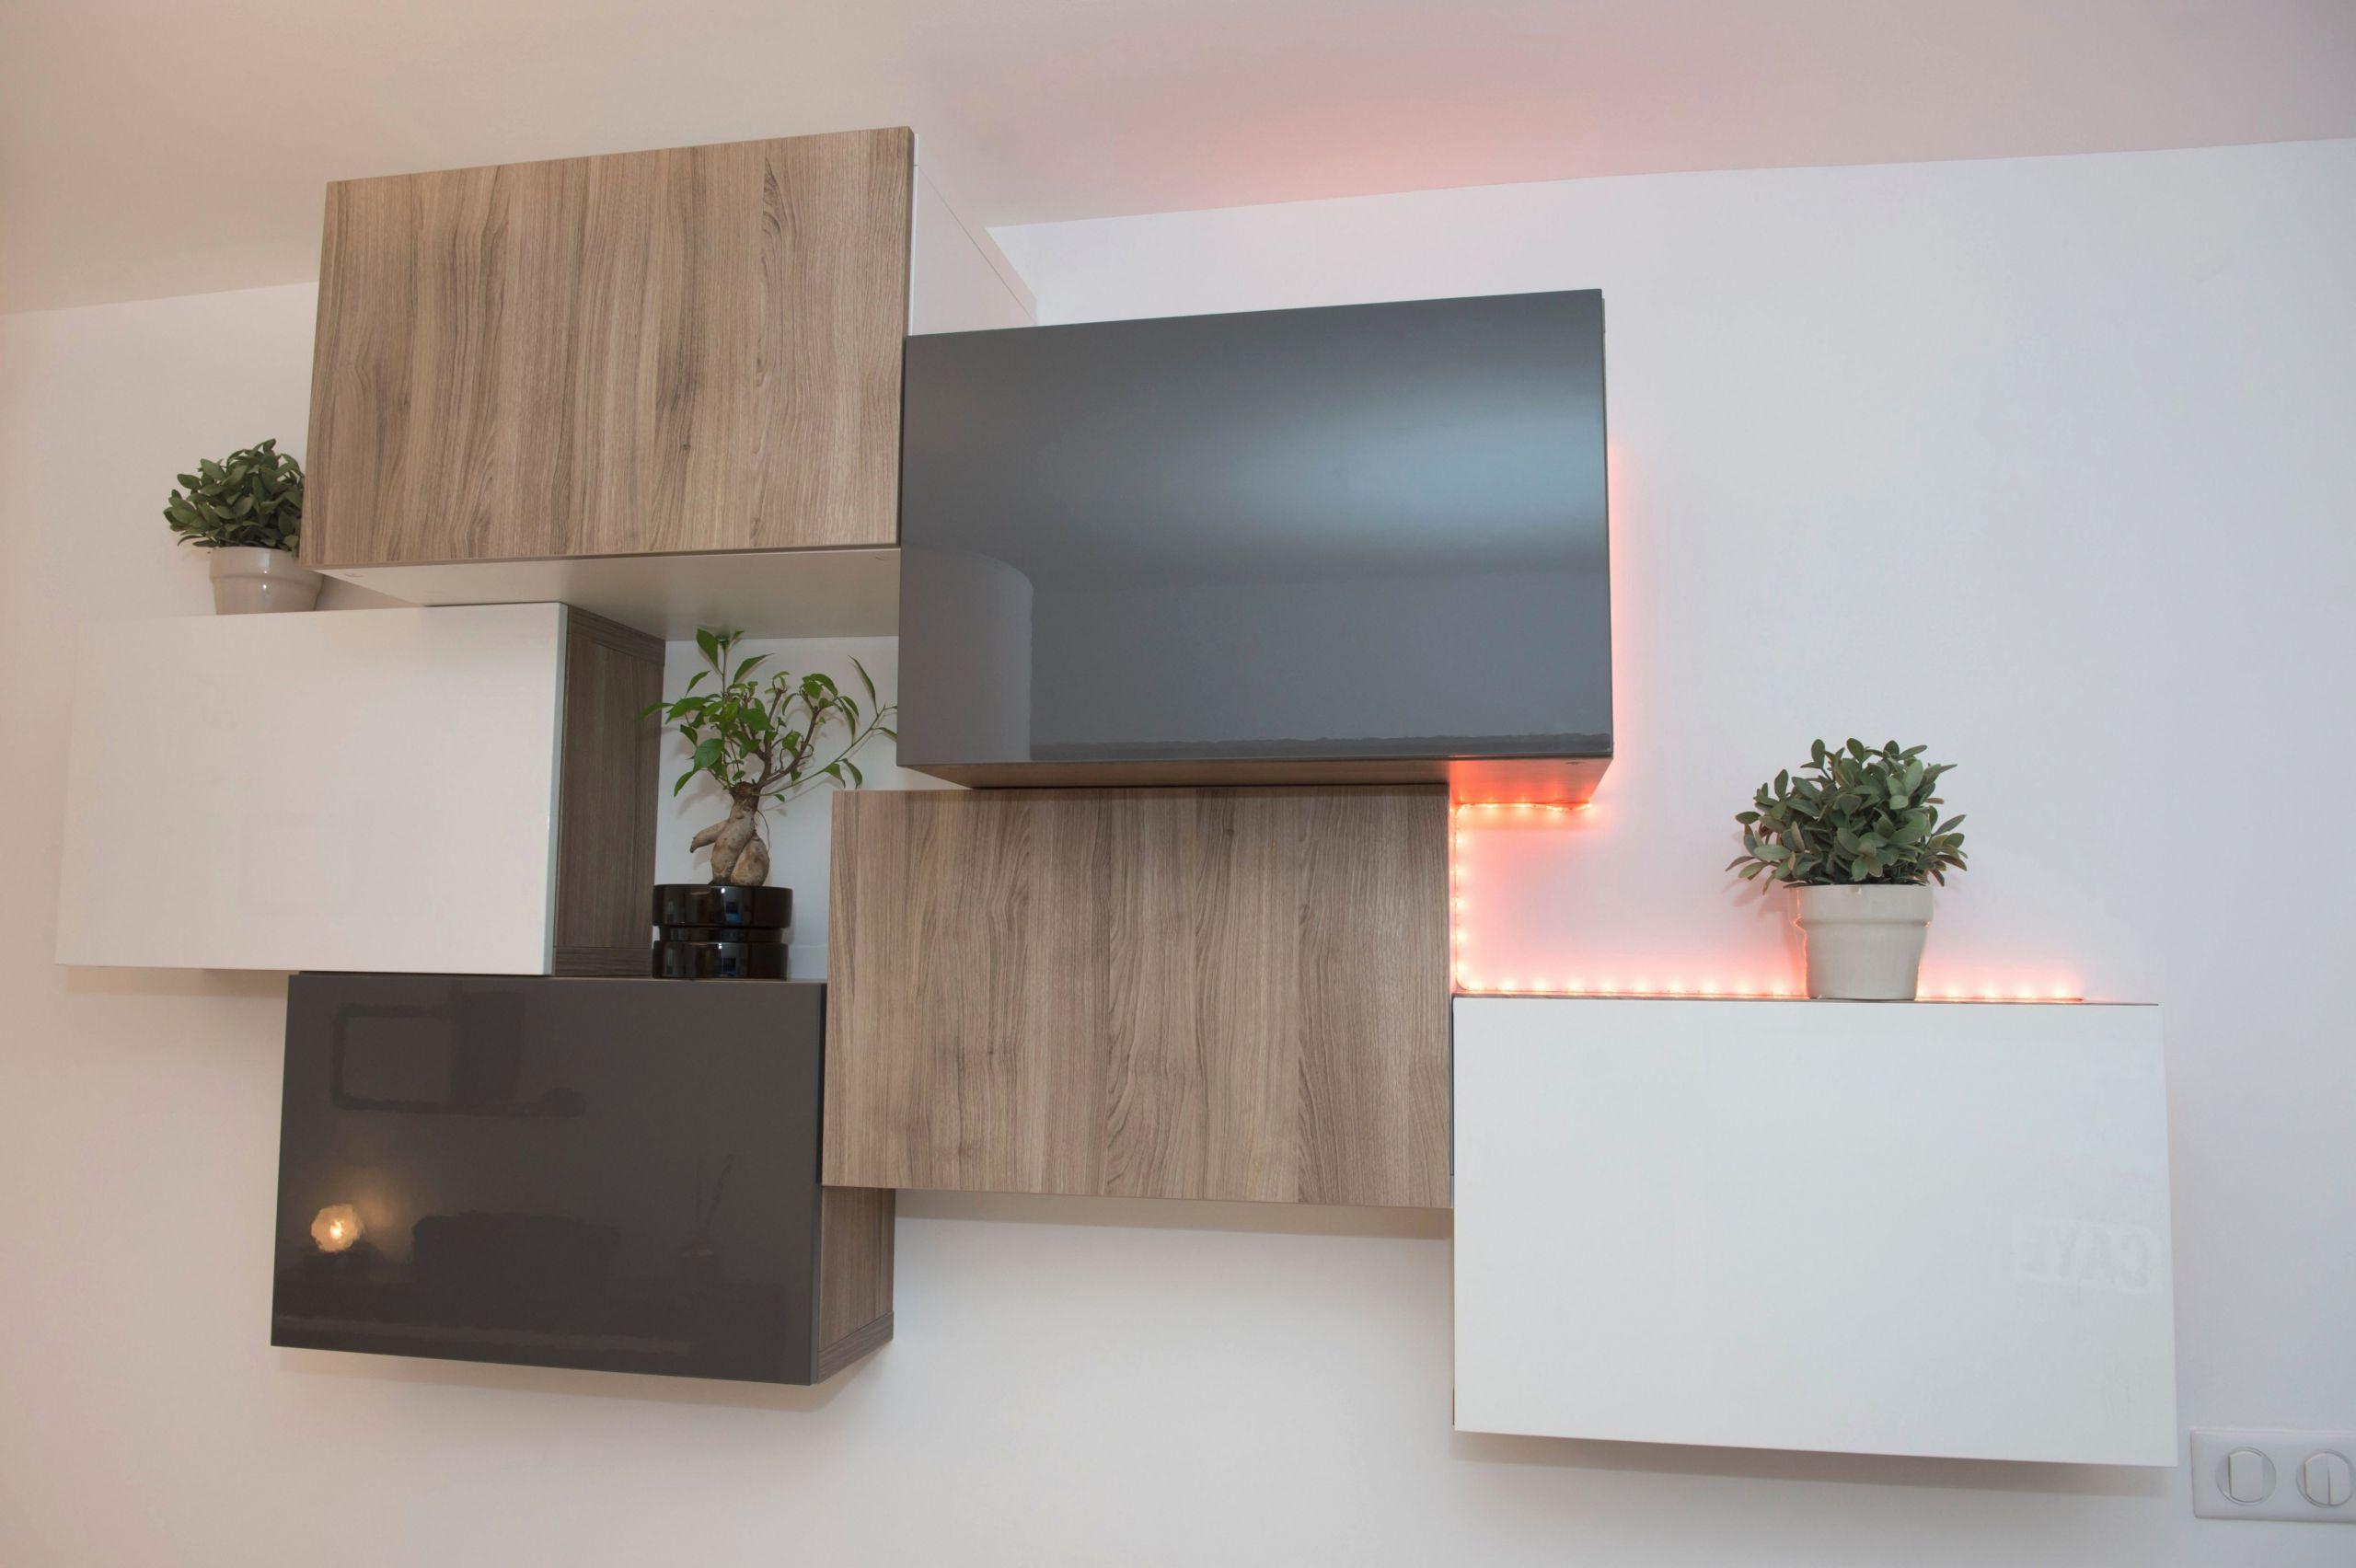 meuble tele groupon groupon table basse groupon salon de jardin groupon coiffeur of meuble tele groupon